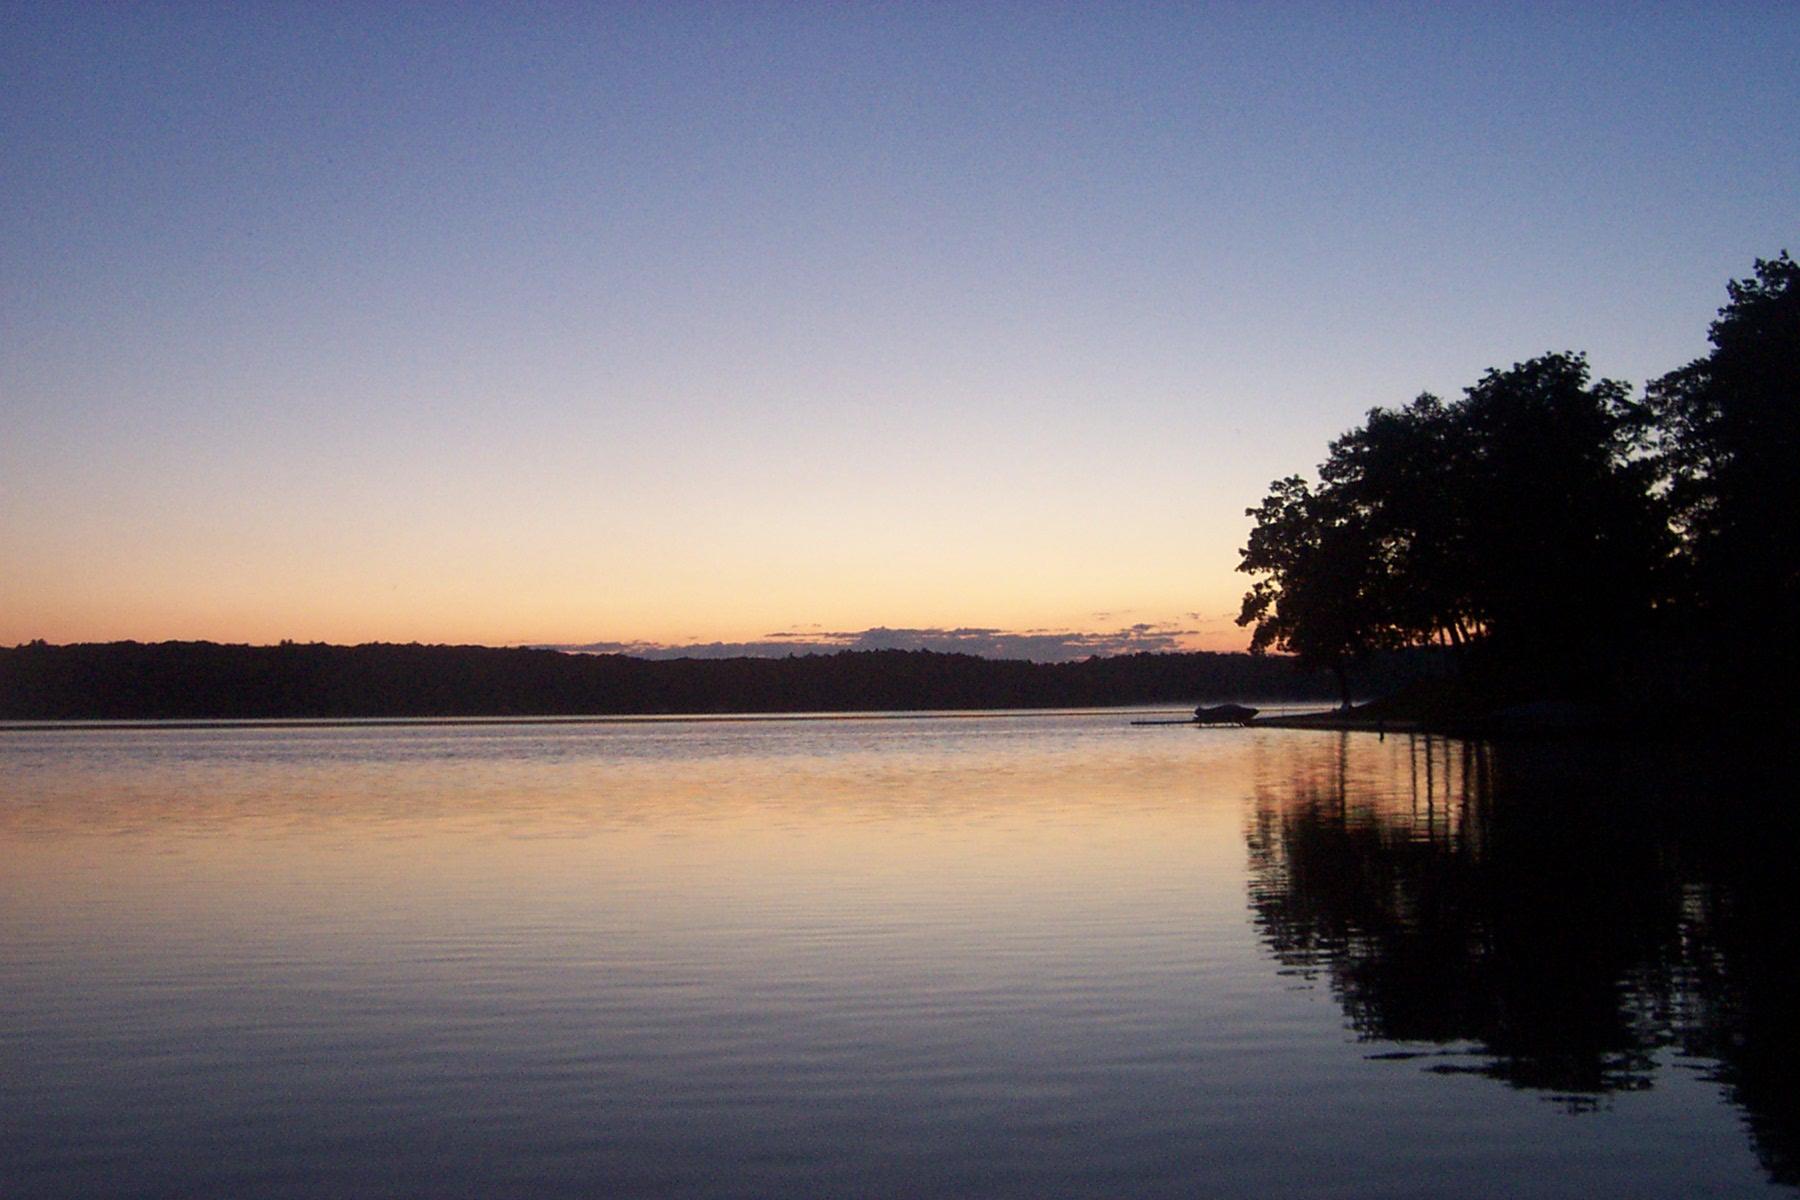 Hamlin_Lake,_July_2005_-_panoramio